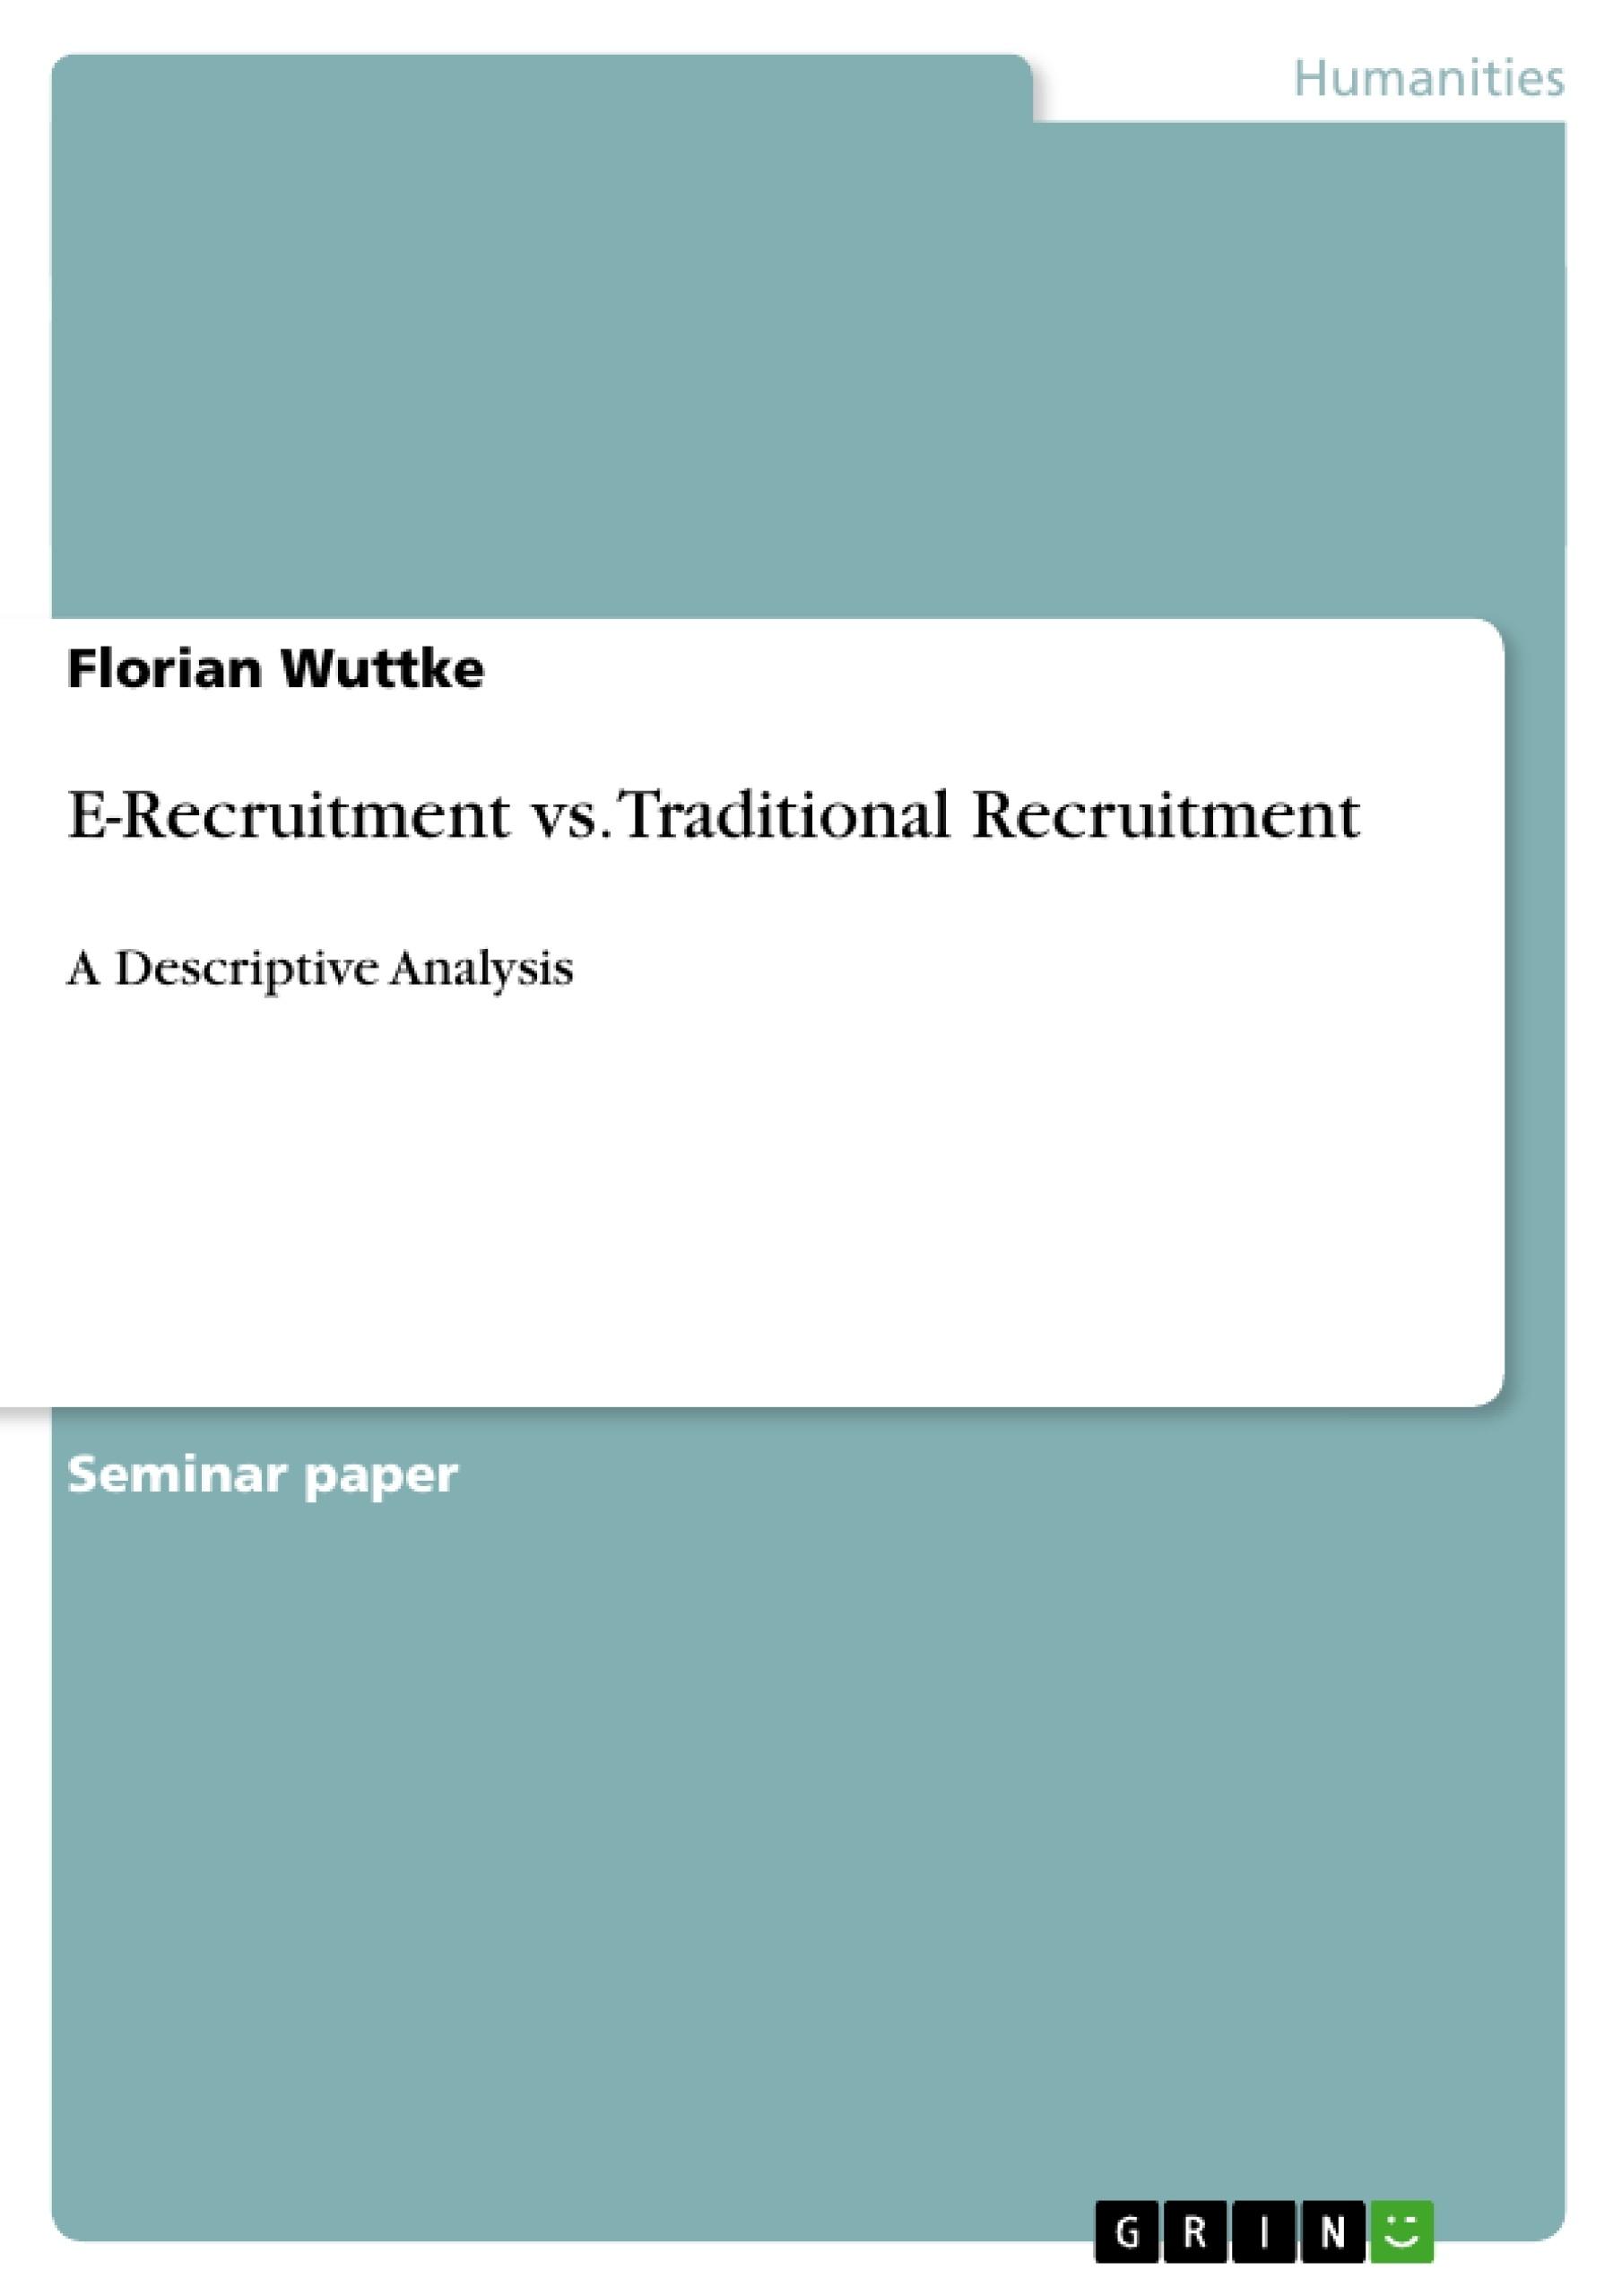 Title: E-Recruitment vs. Traditional Recruitment